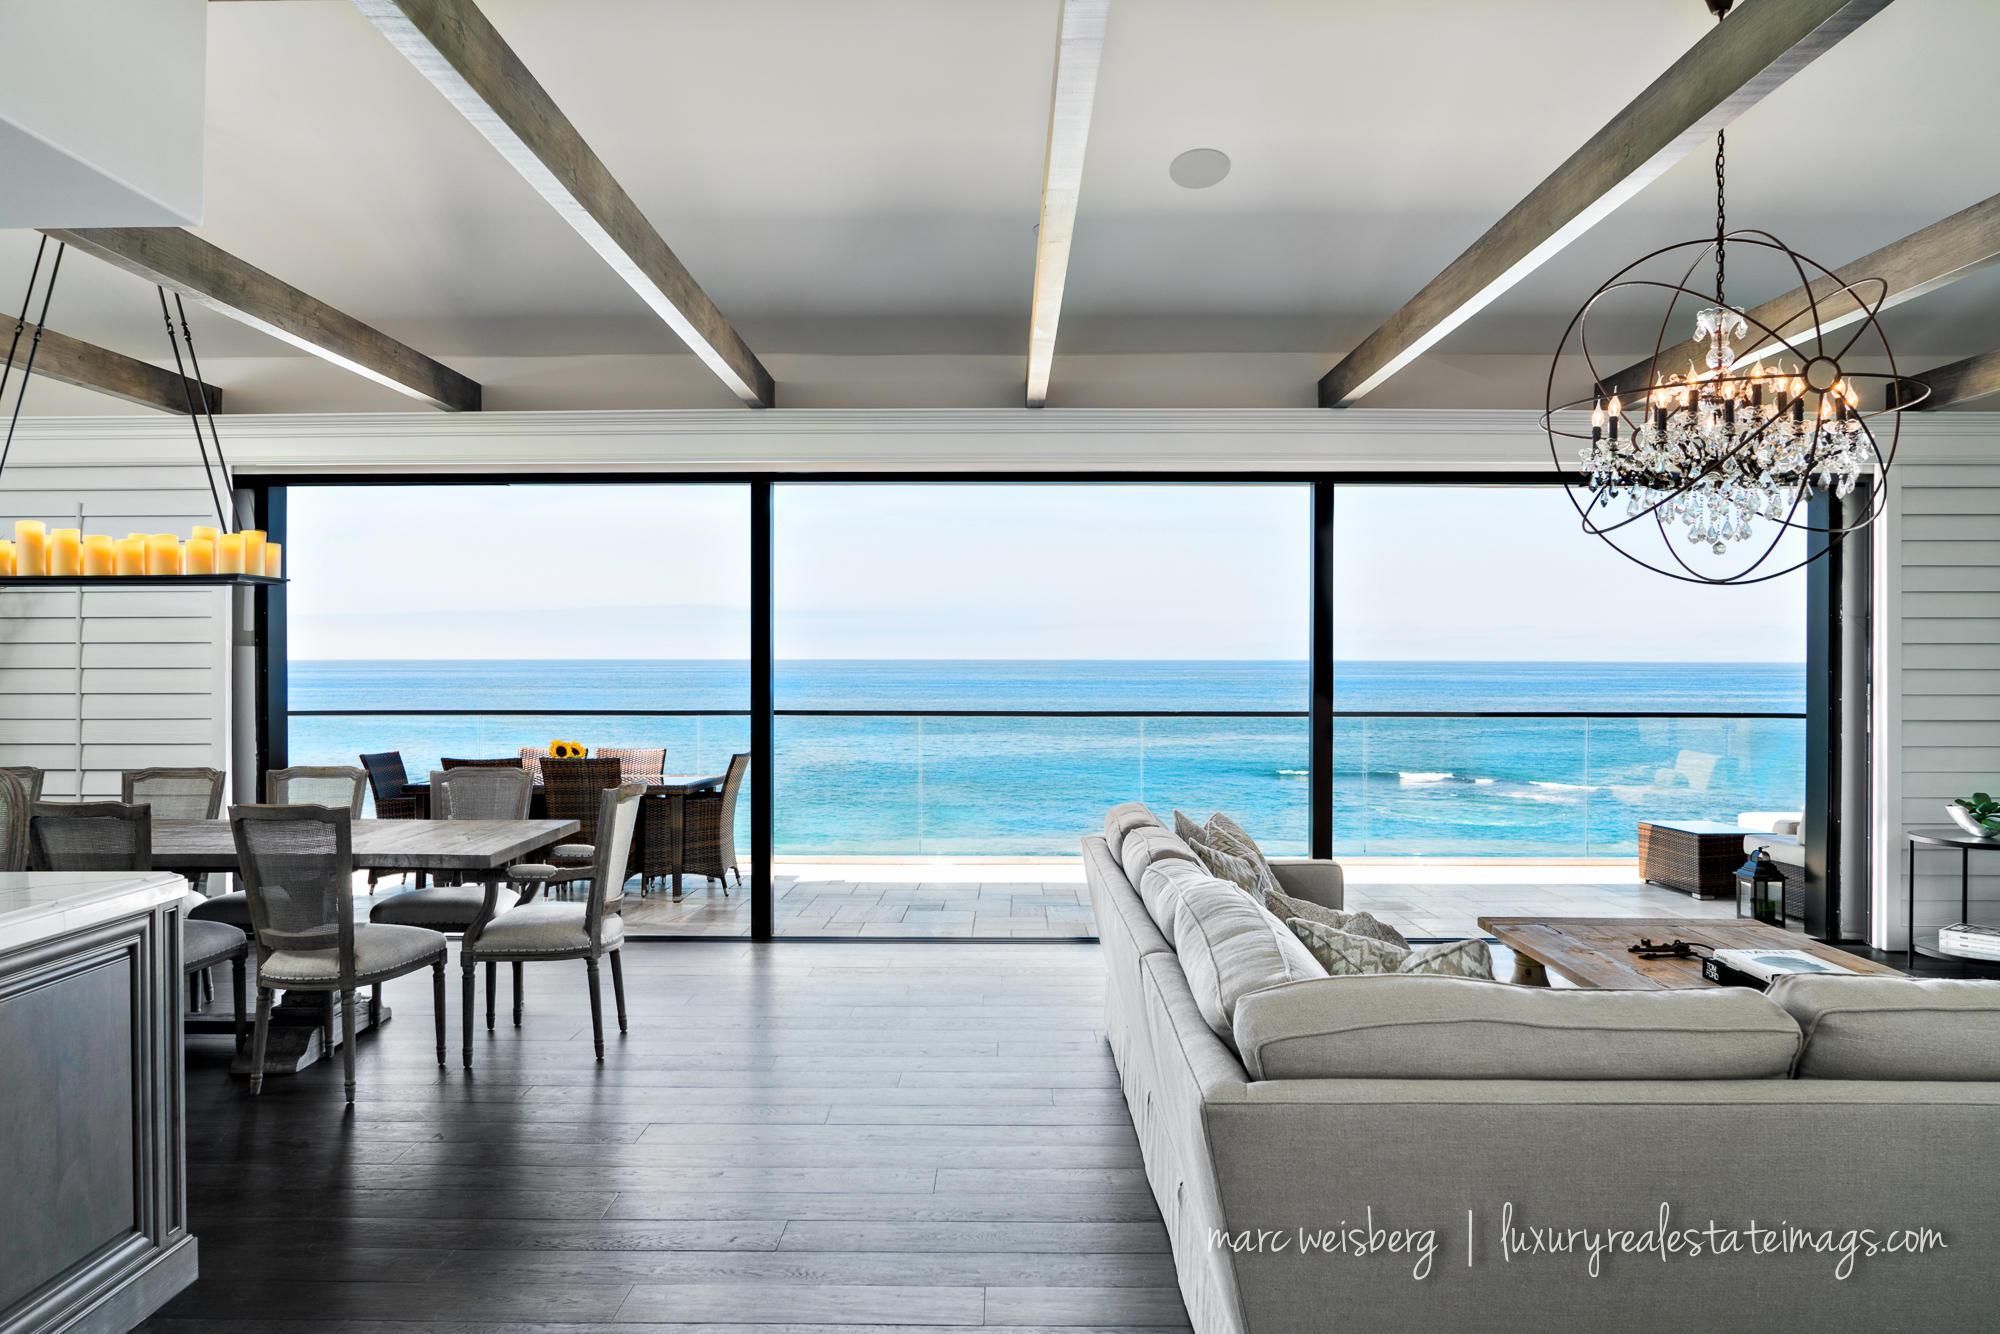 Payton Addison Inc, Interior Design Atelier image 1